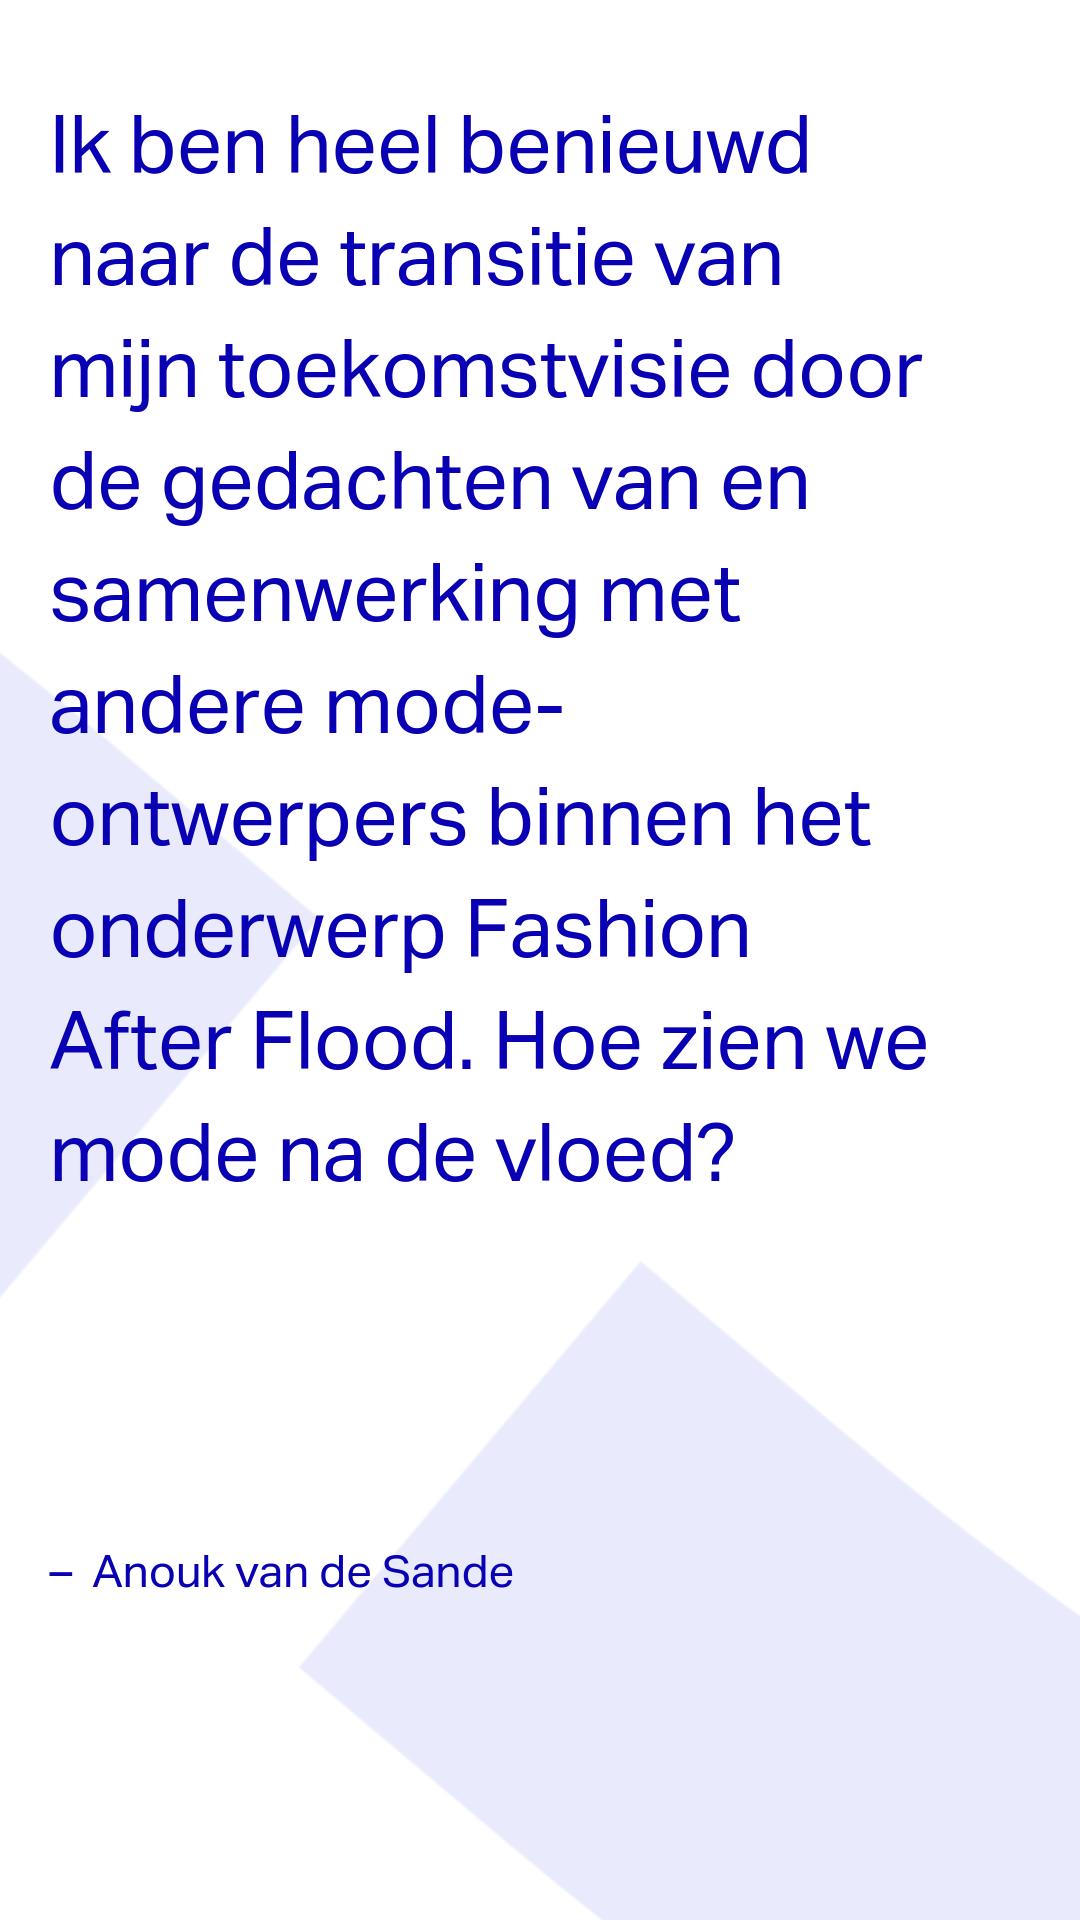 Taskforce-Fashion-Fashion-After-Flood-Kennismaking-Maastricht-Anouk-vande-sande_1.png